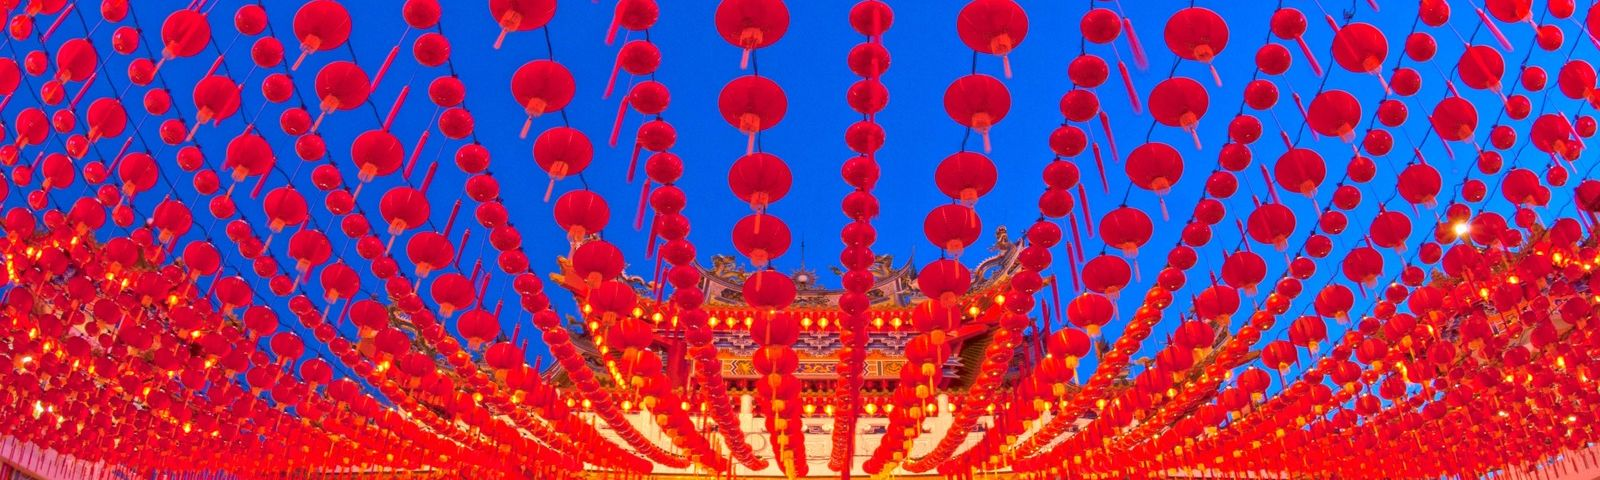 Asien Sehenswürdigkeiten: Thean Hou Tempel in Malaysia